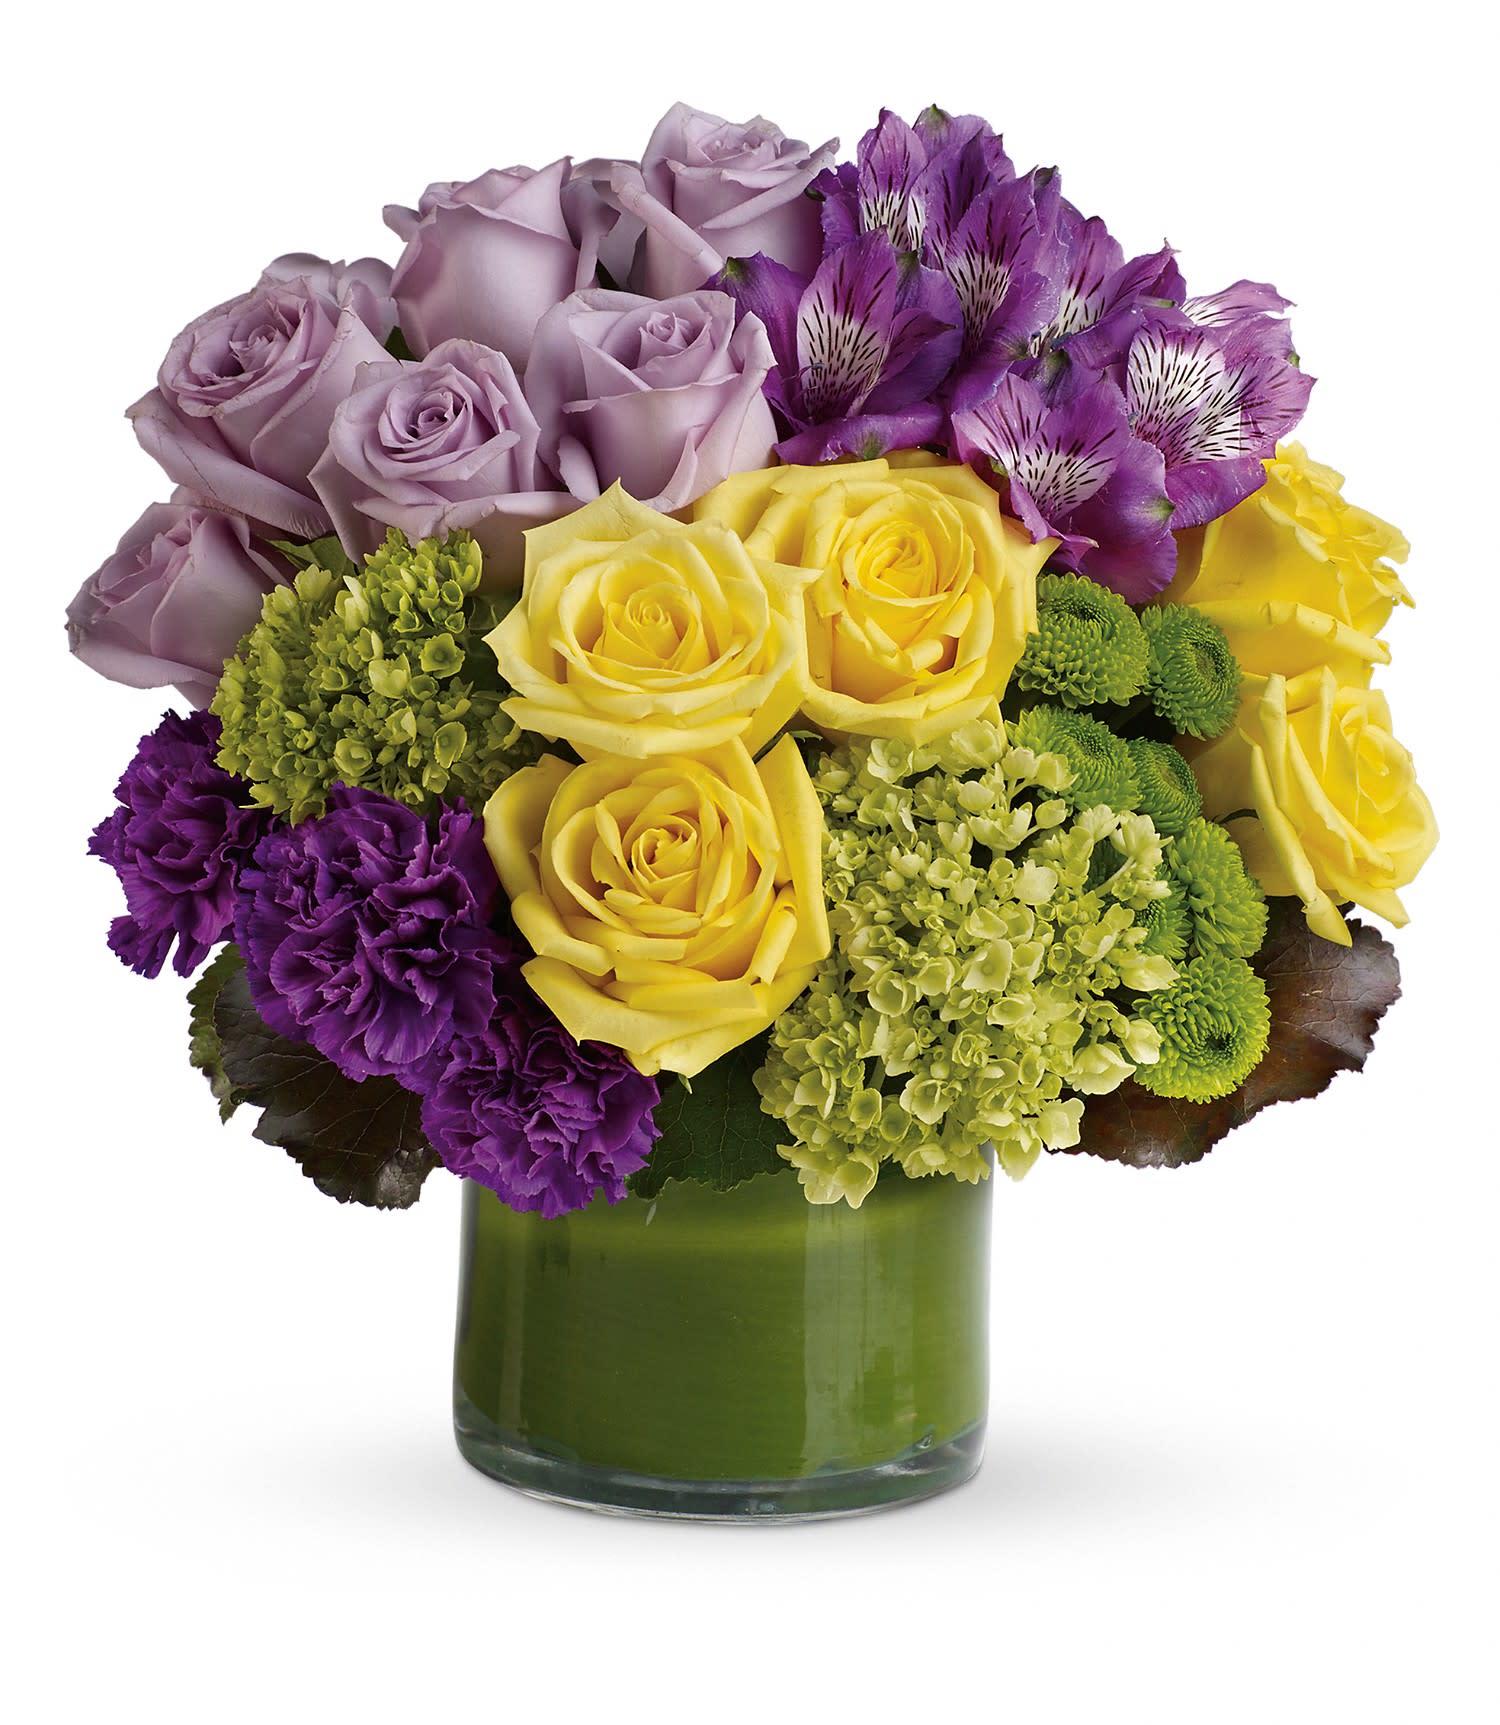 Simply Splendid Bouquet in New York City, NY | New York Best Florist